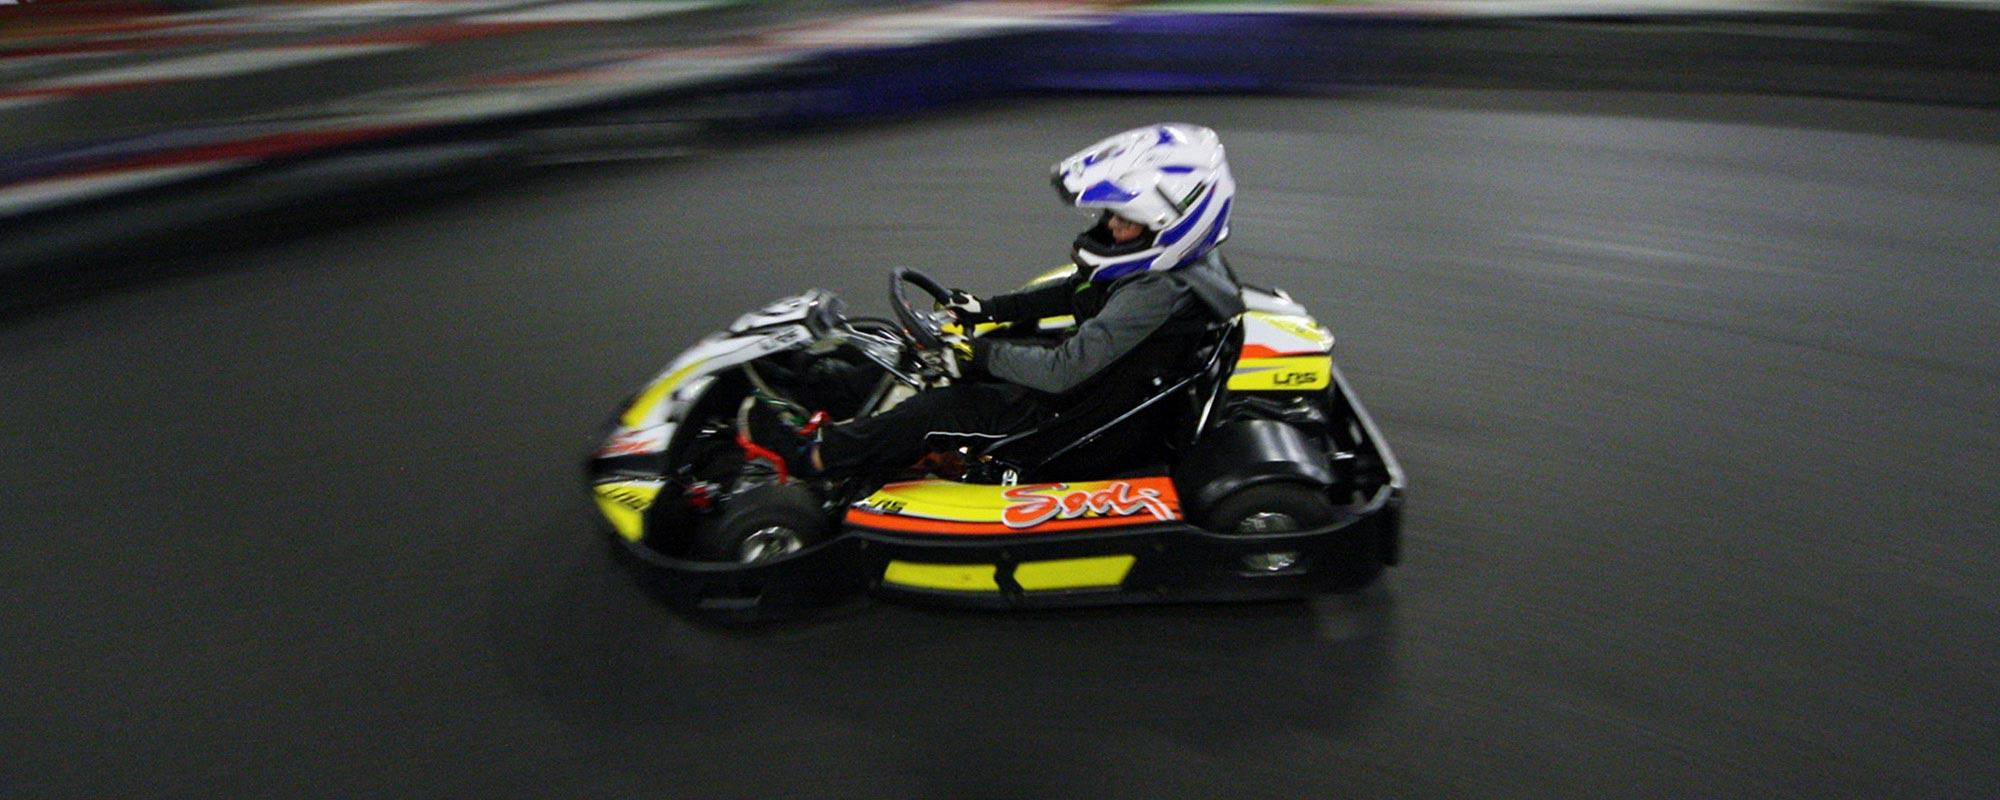 ebafkc-juniorkarting-2000x800-16